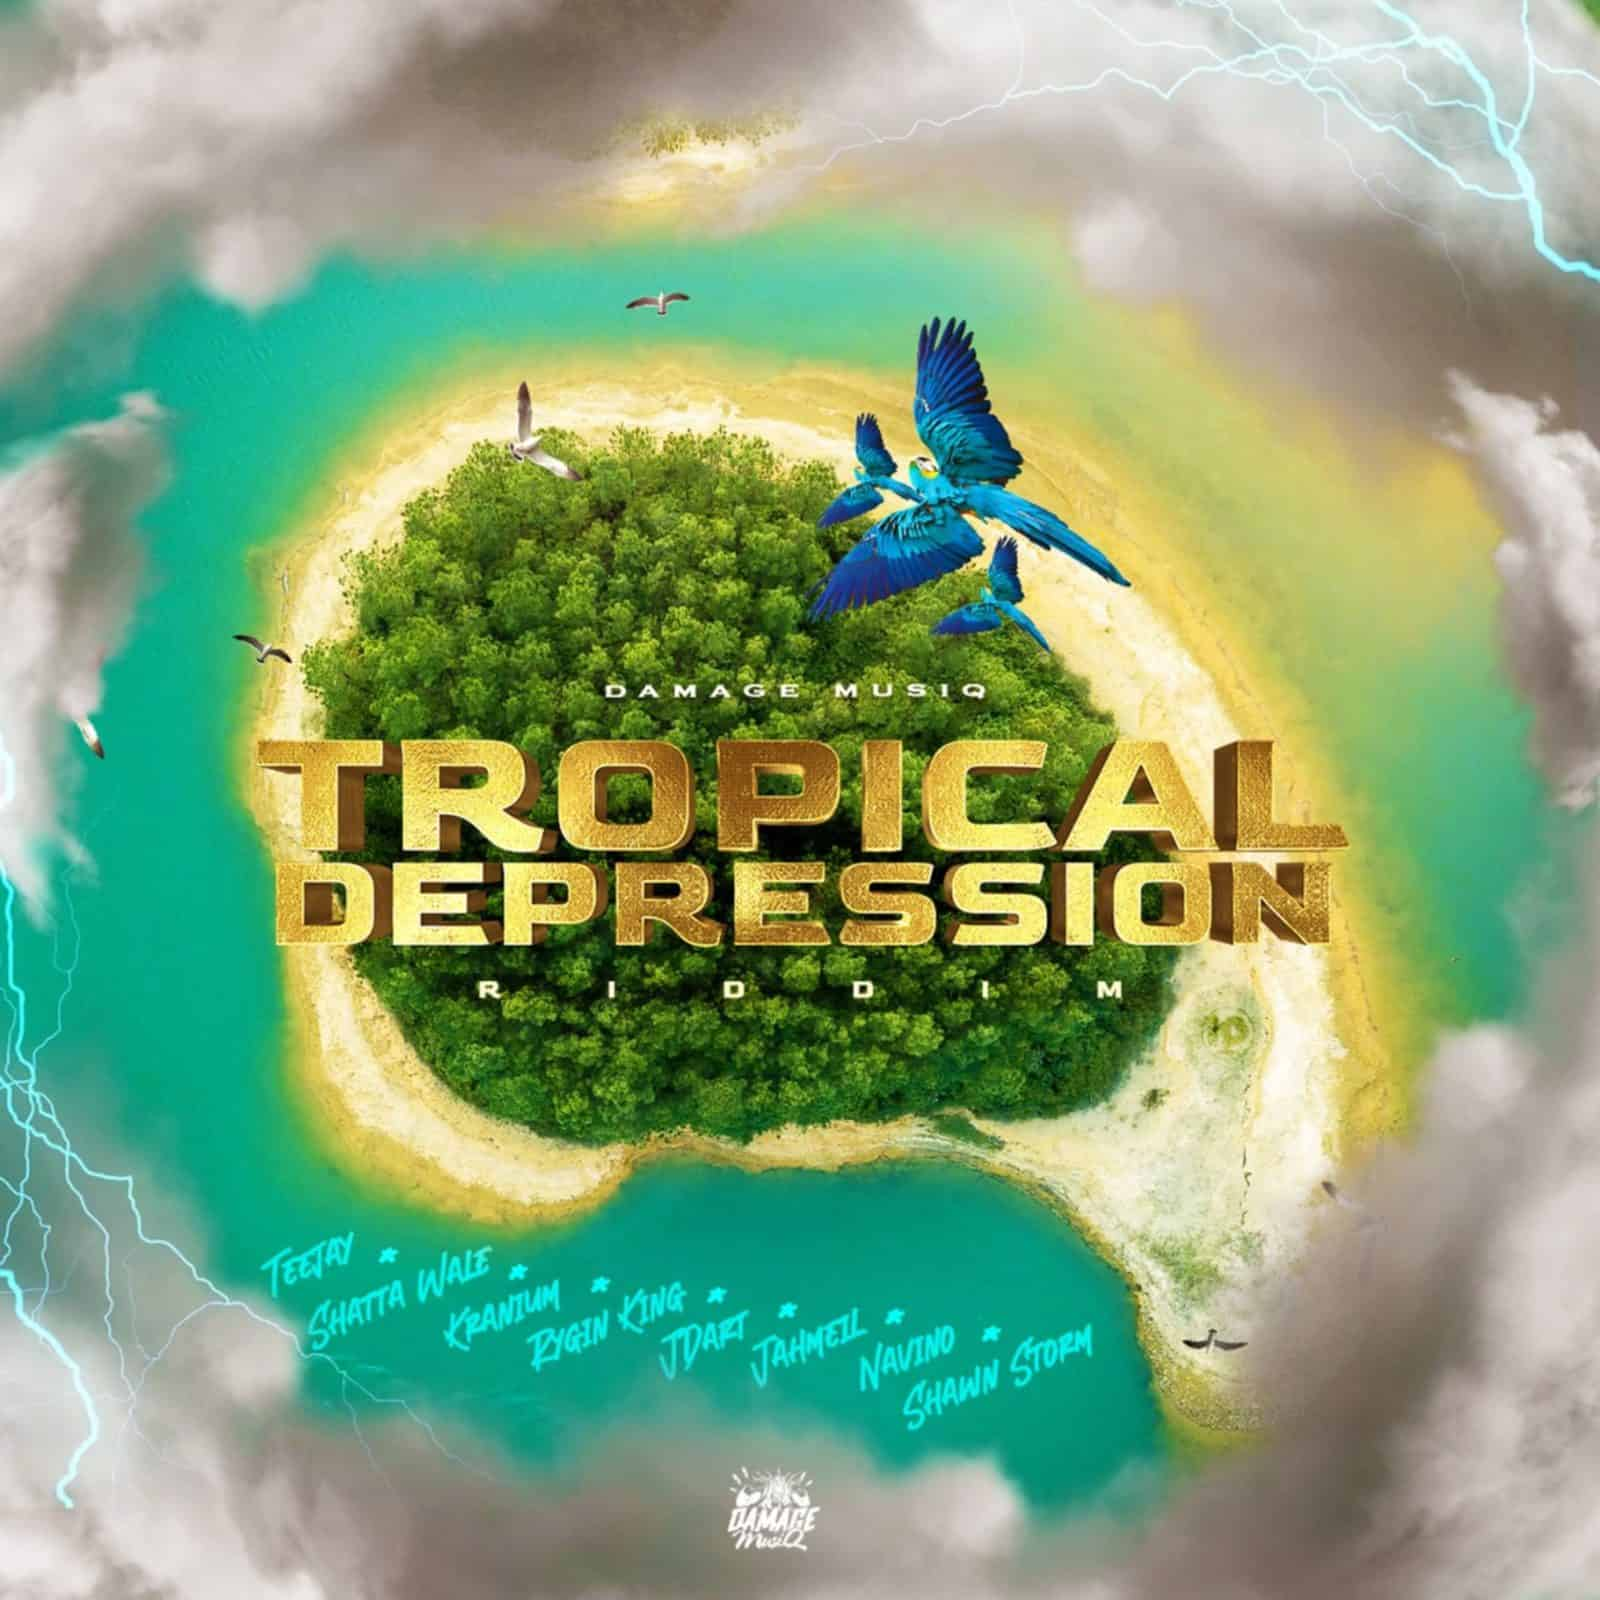 Tropical Depression Riddim - Damage Musiq